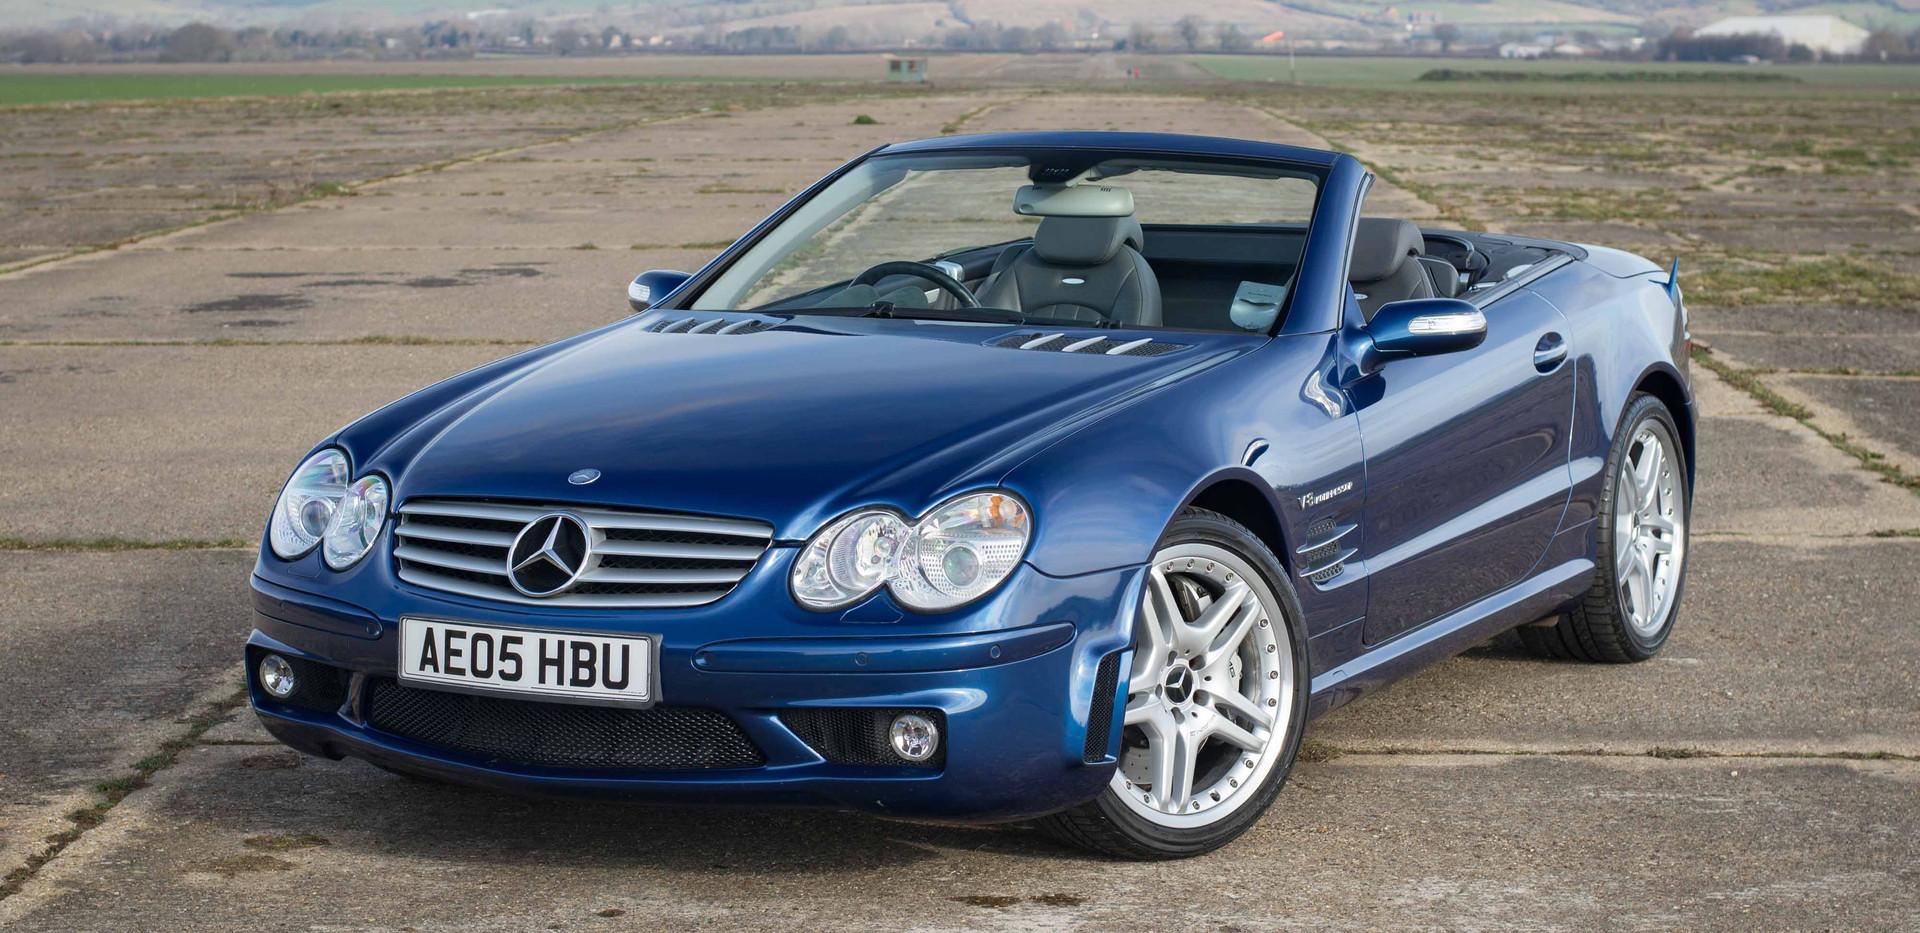 SL55 For Sale UK London  (4 of 36).jpg